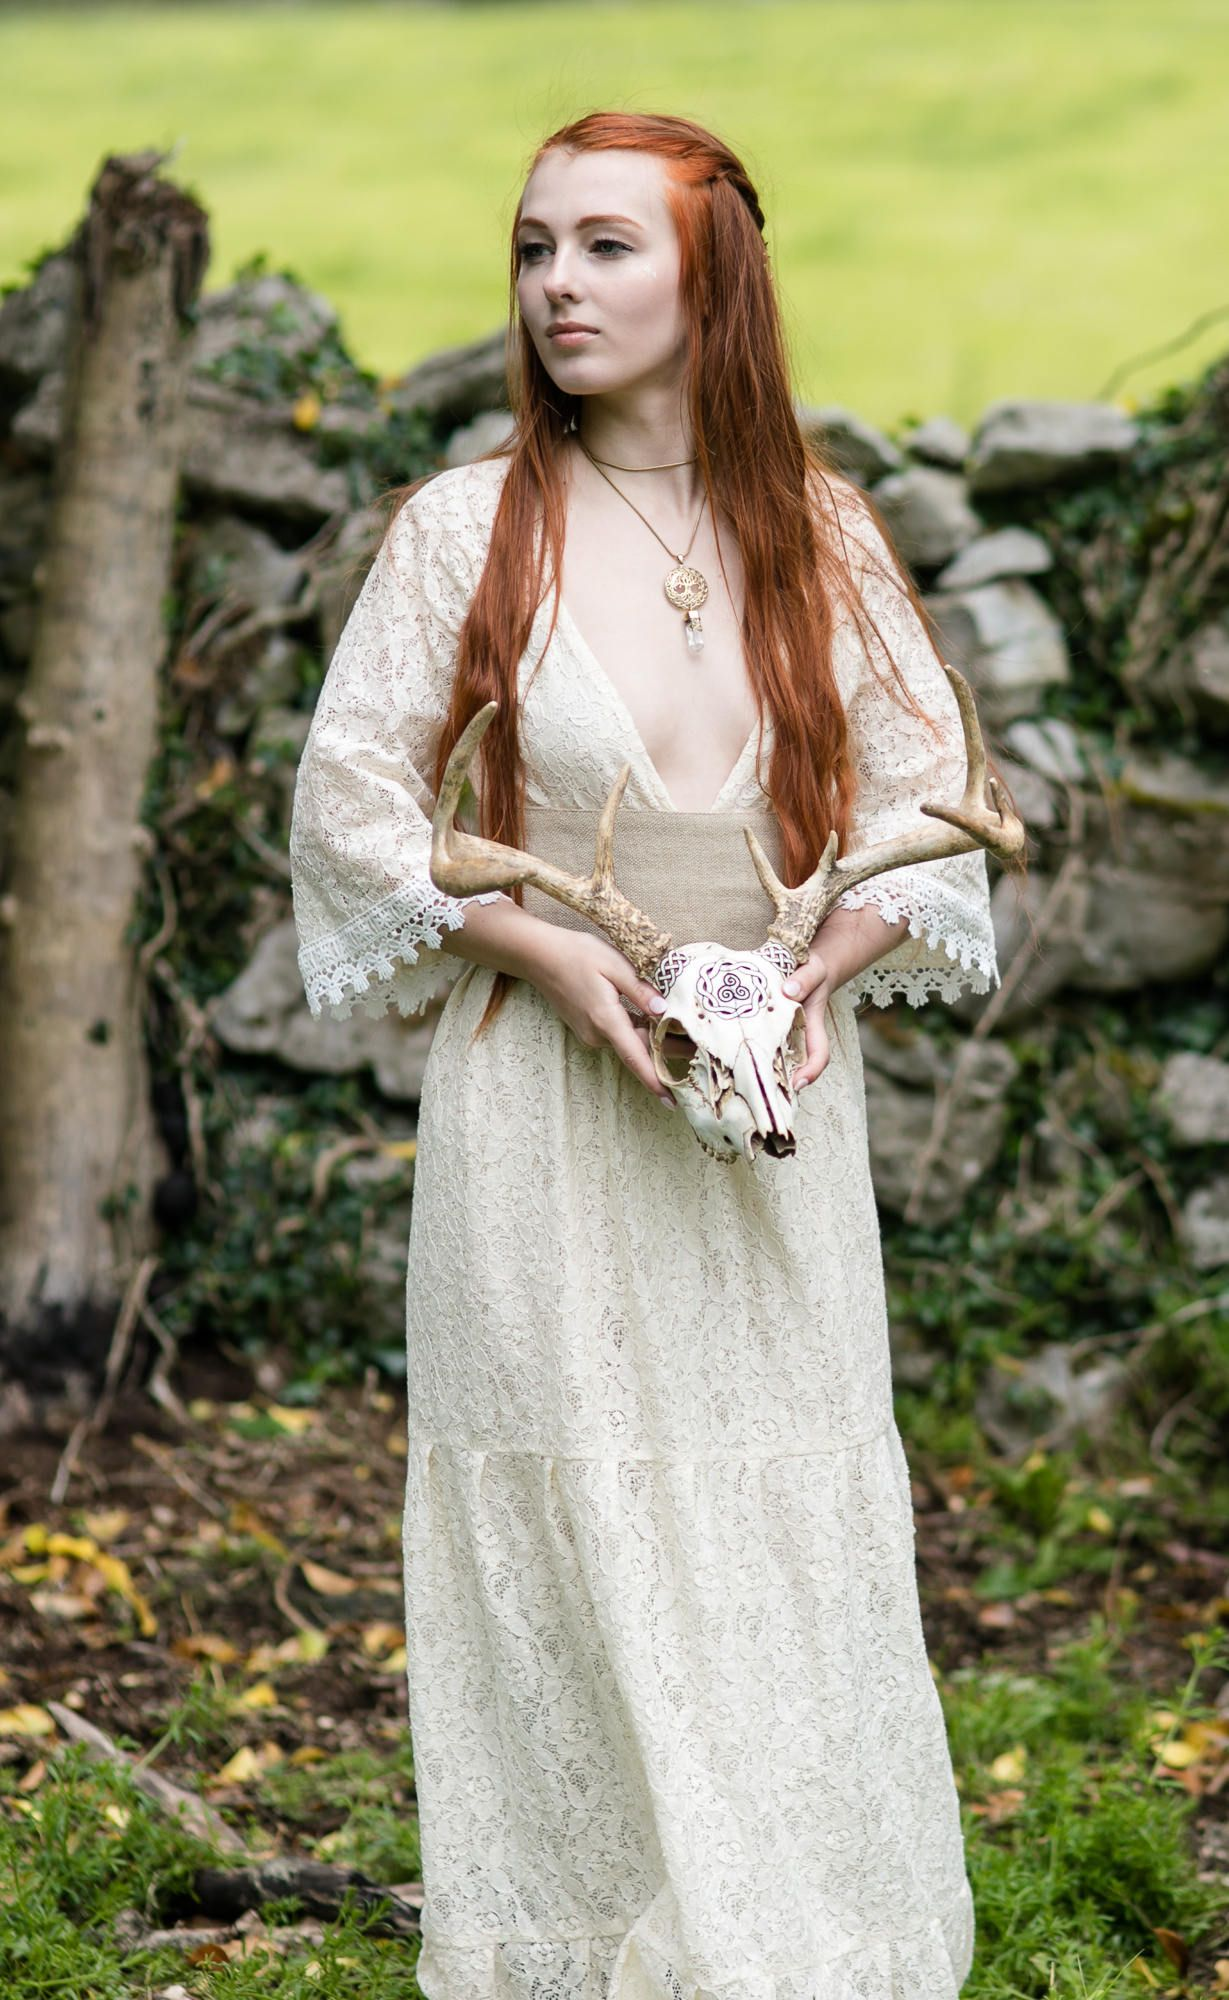 Celtic wedding dress  Divinty Lace wedding Dress Low plunge neckline Wedding Dress Sexy